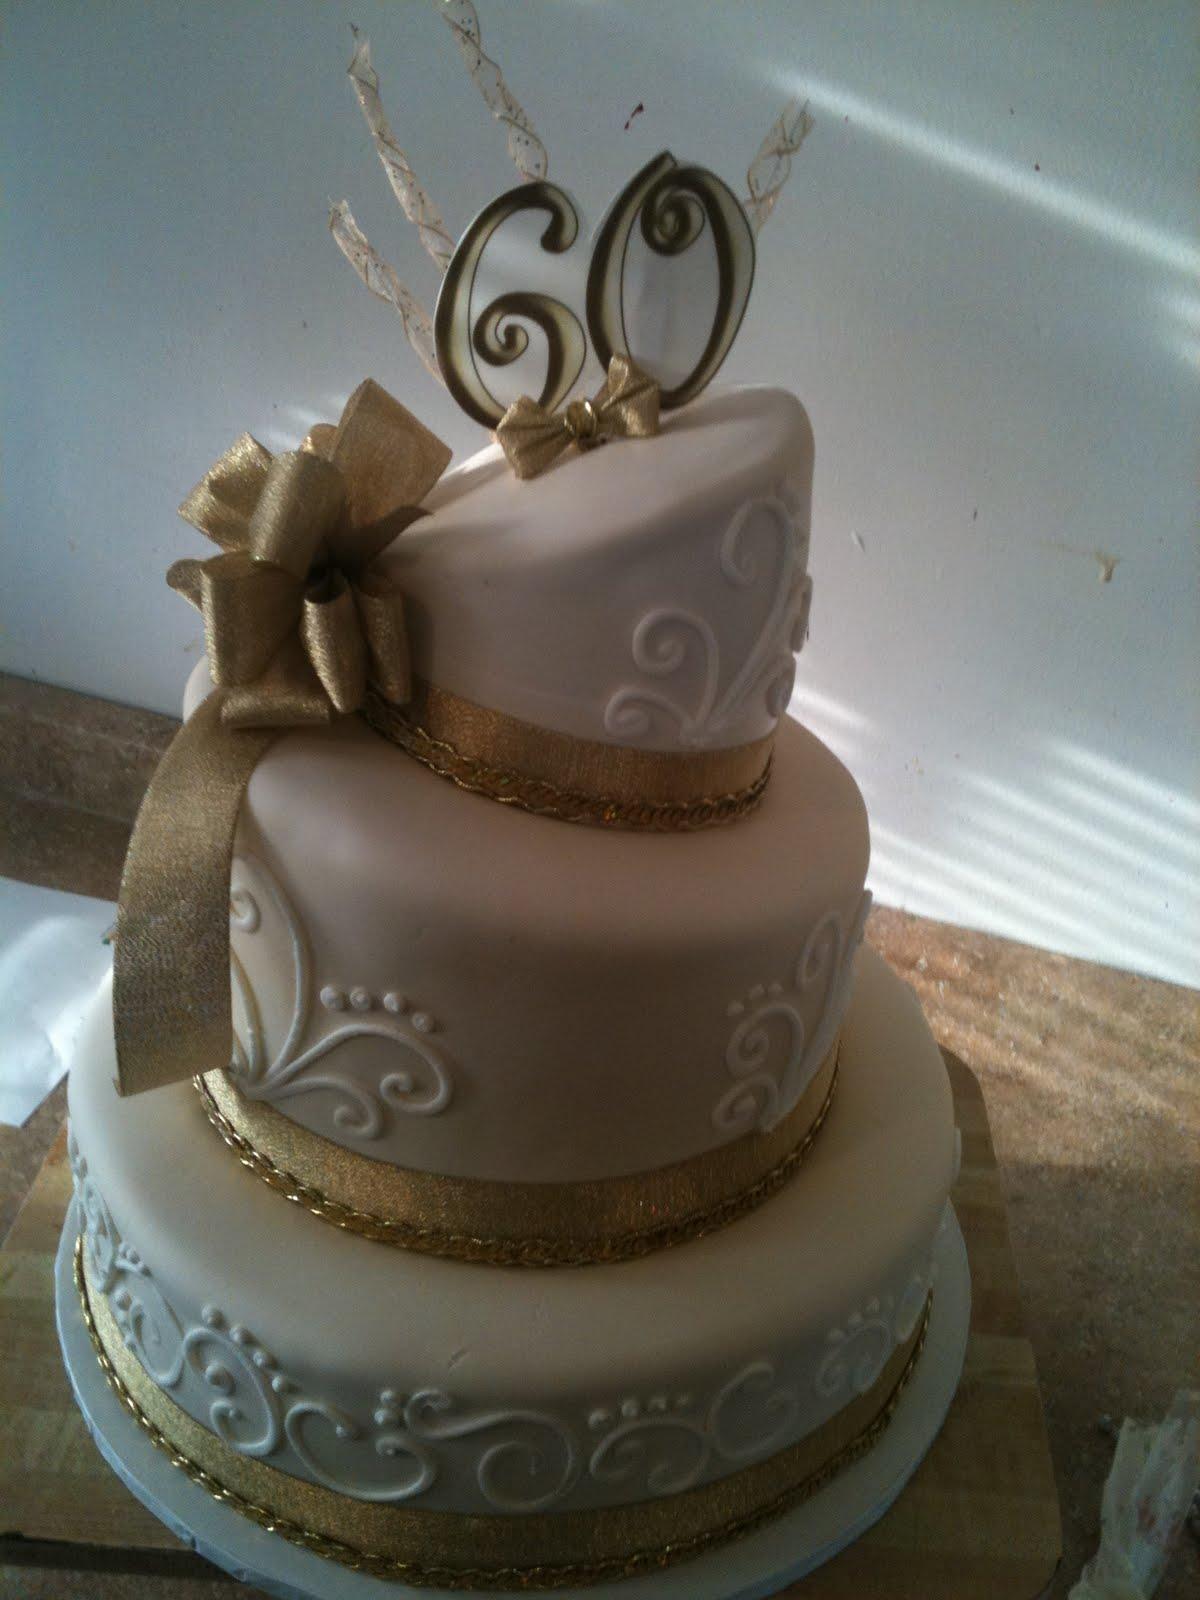 Hectors Custom Cakes 60th Birthday Gold Edition Topsy Turvy